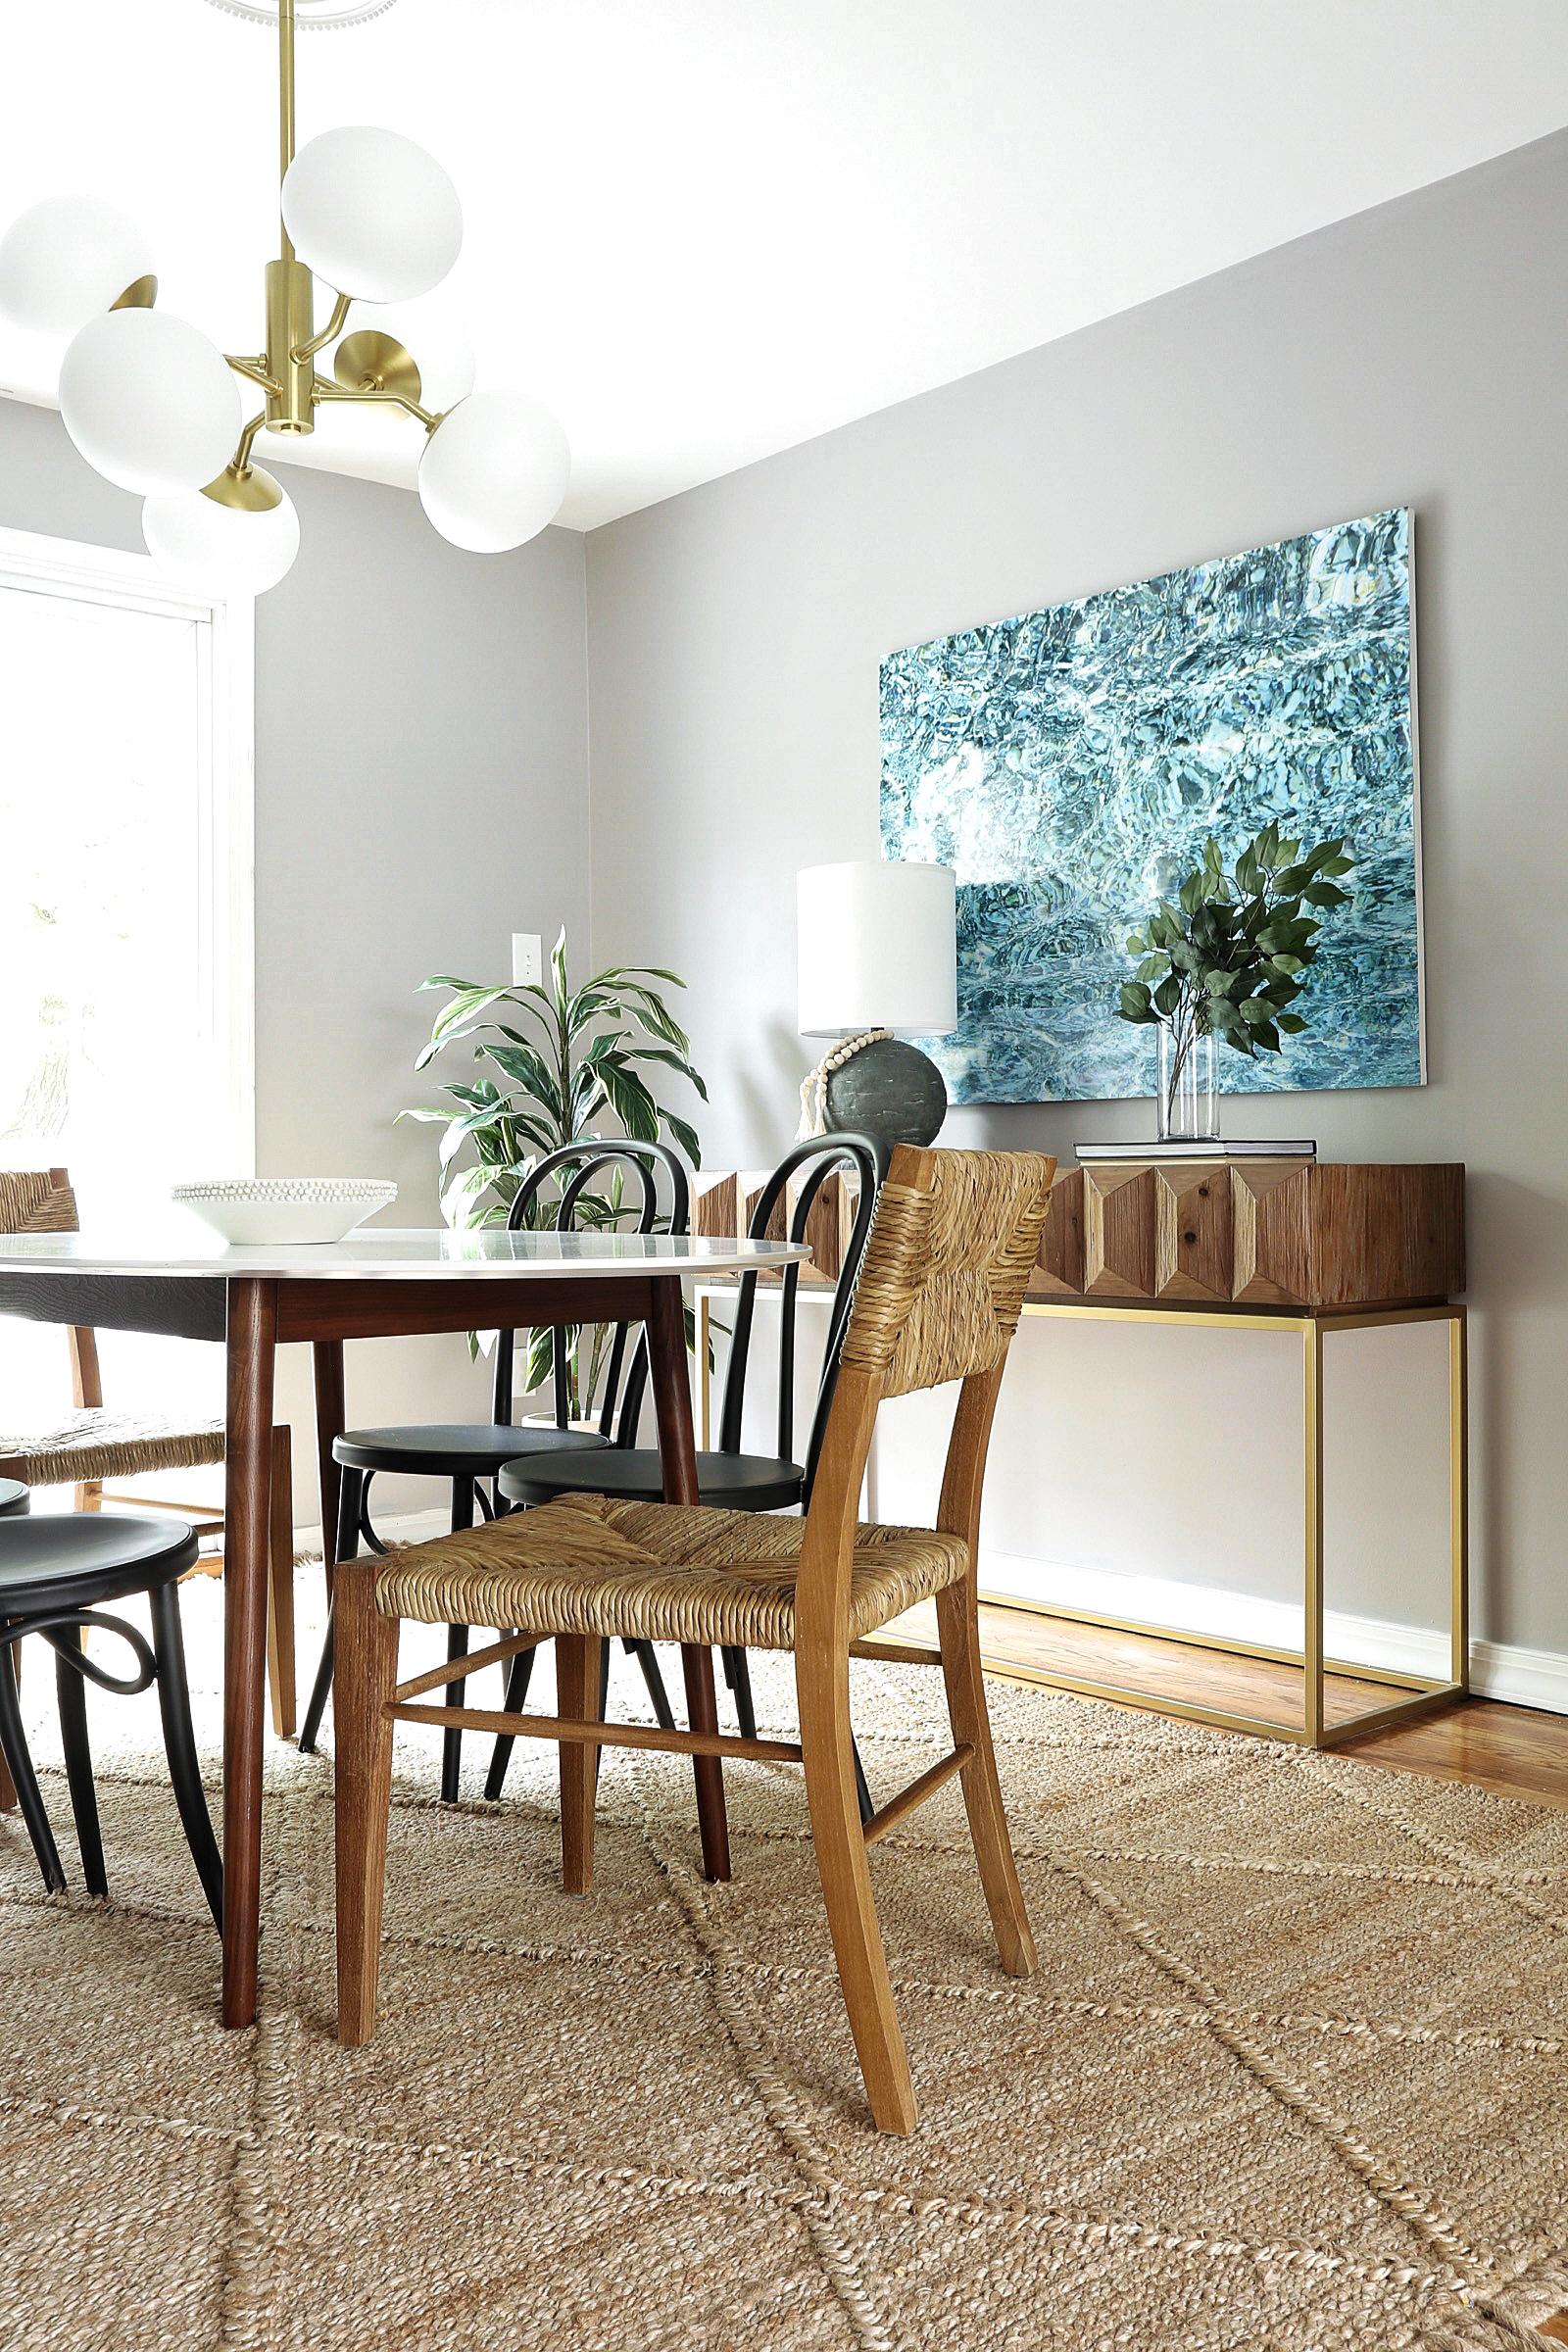 Rush-Seat-Dining-Chair-Modern.jpg